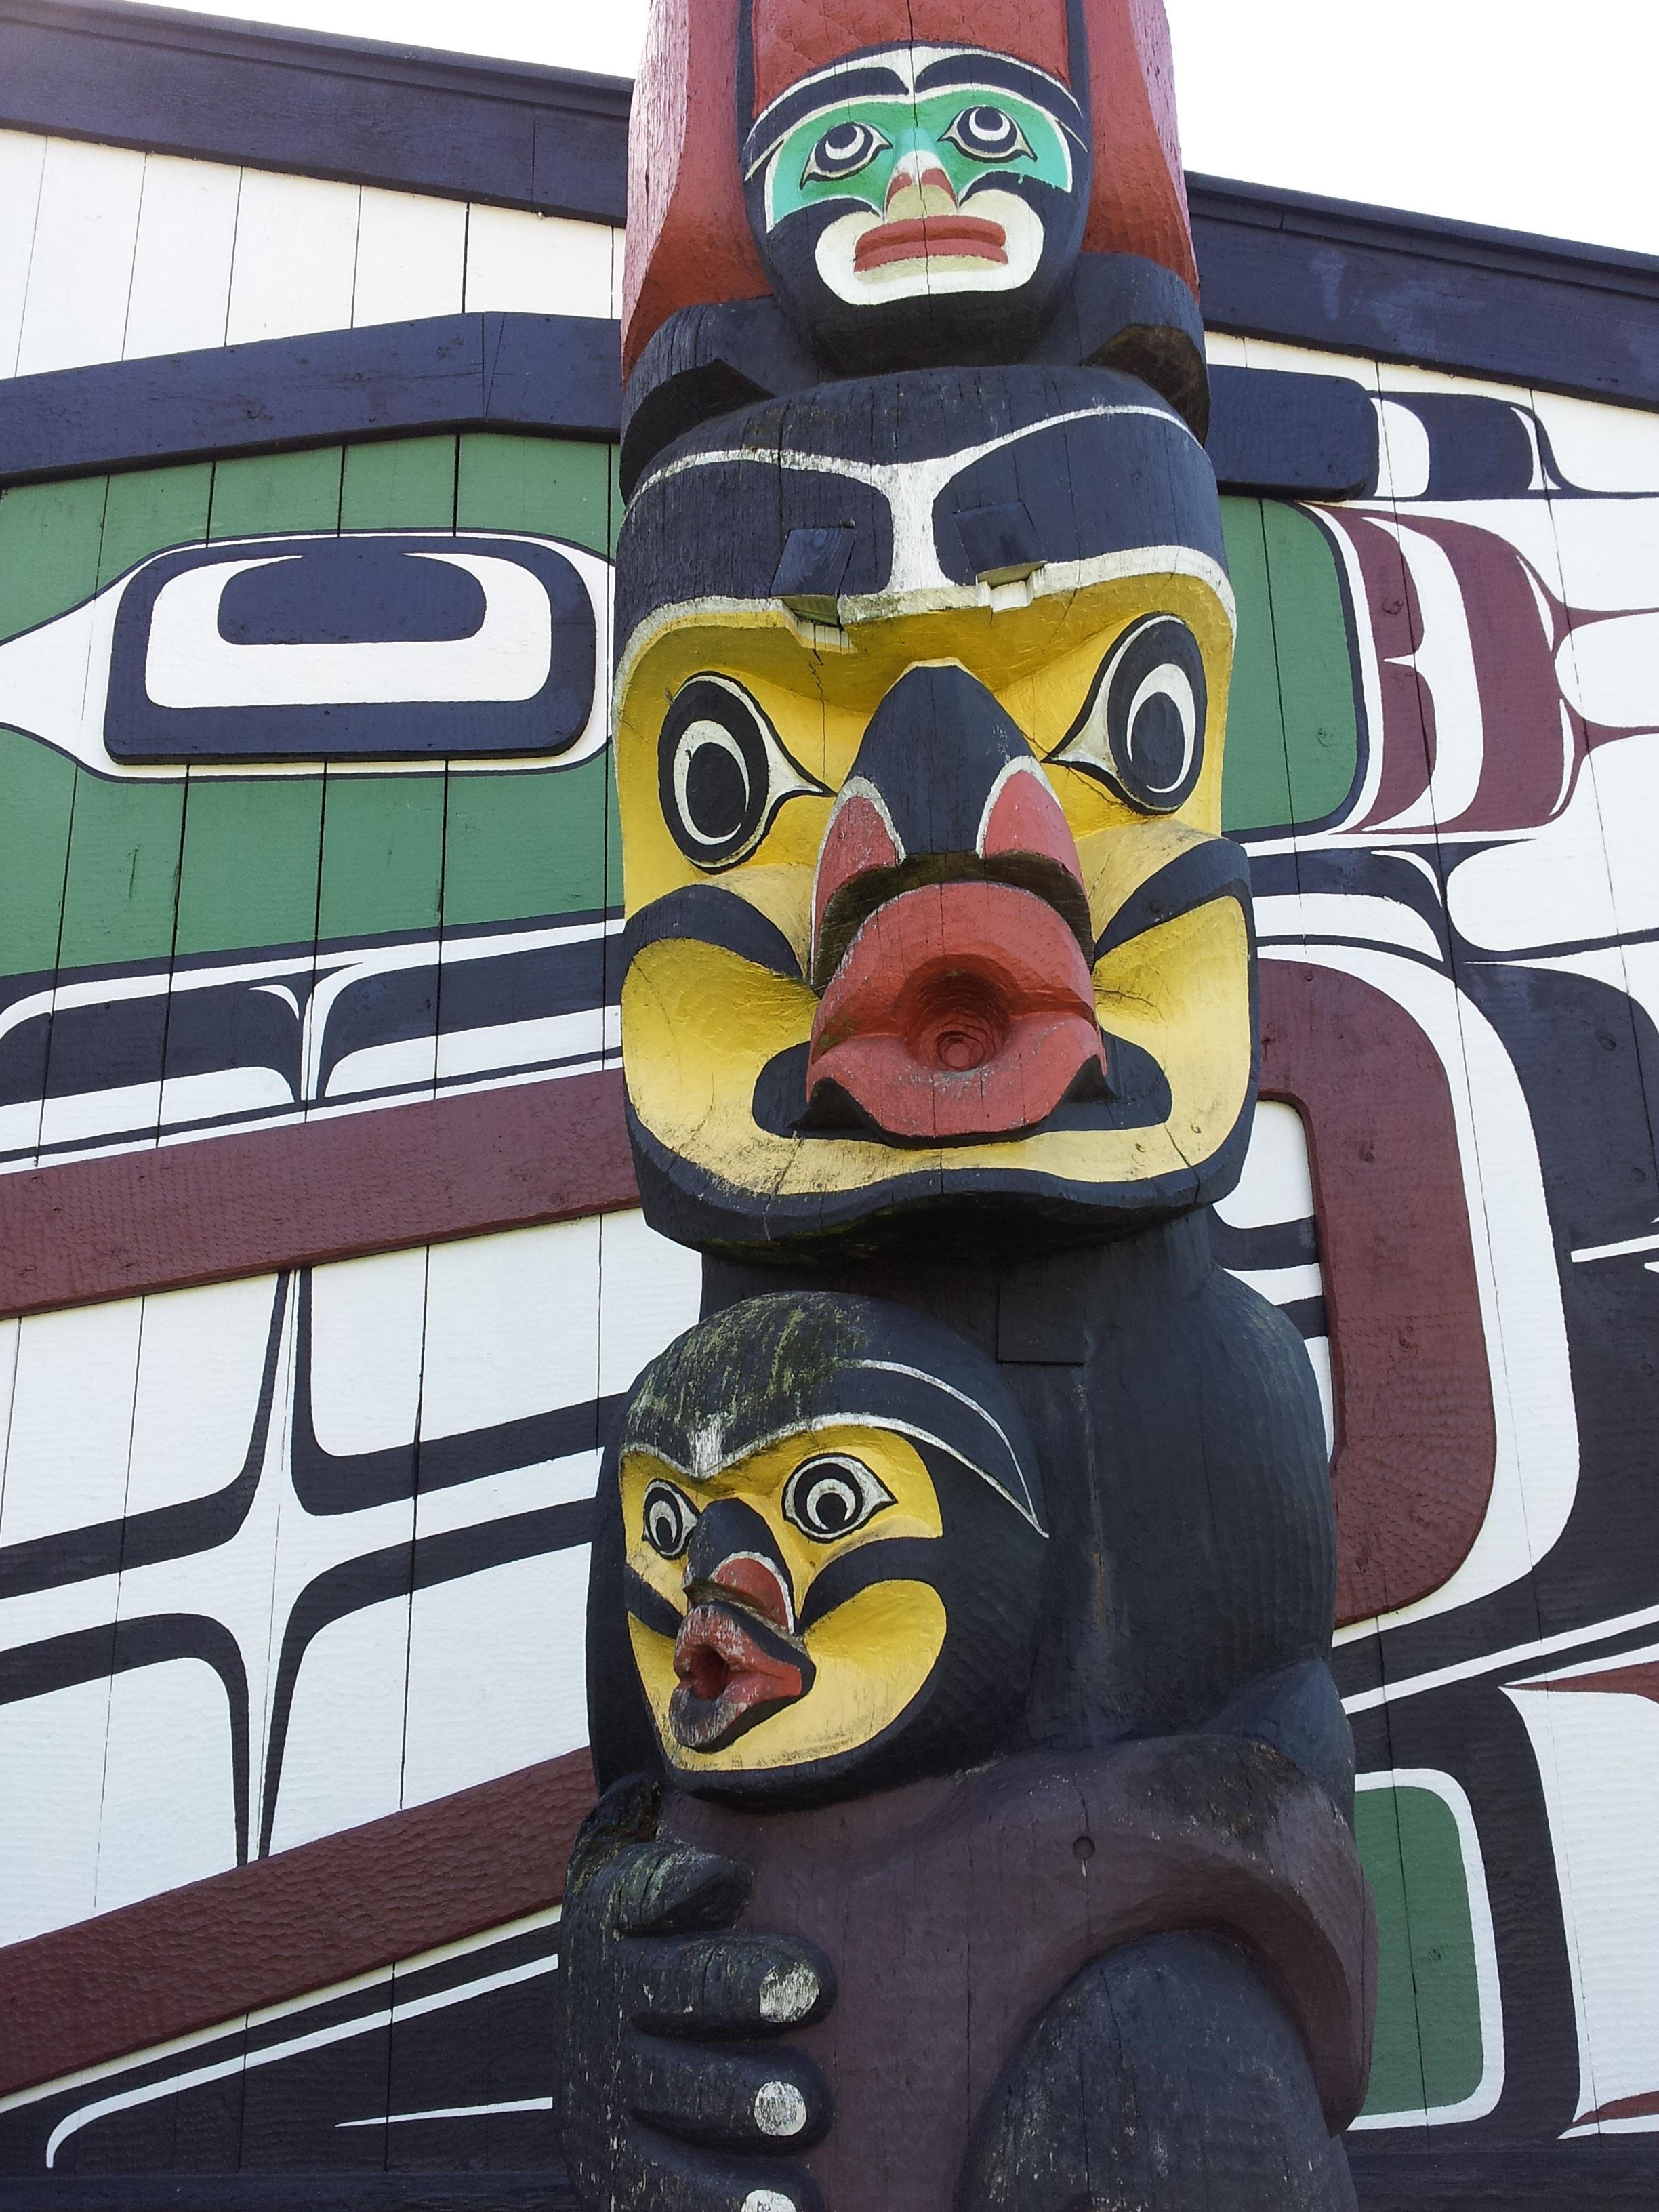 Free Images Wood Animal Symbol Graffiti Totem Pole Street Art